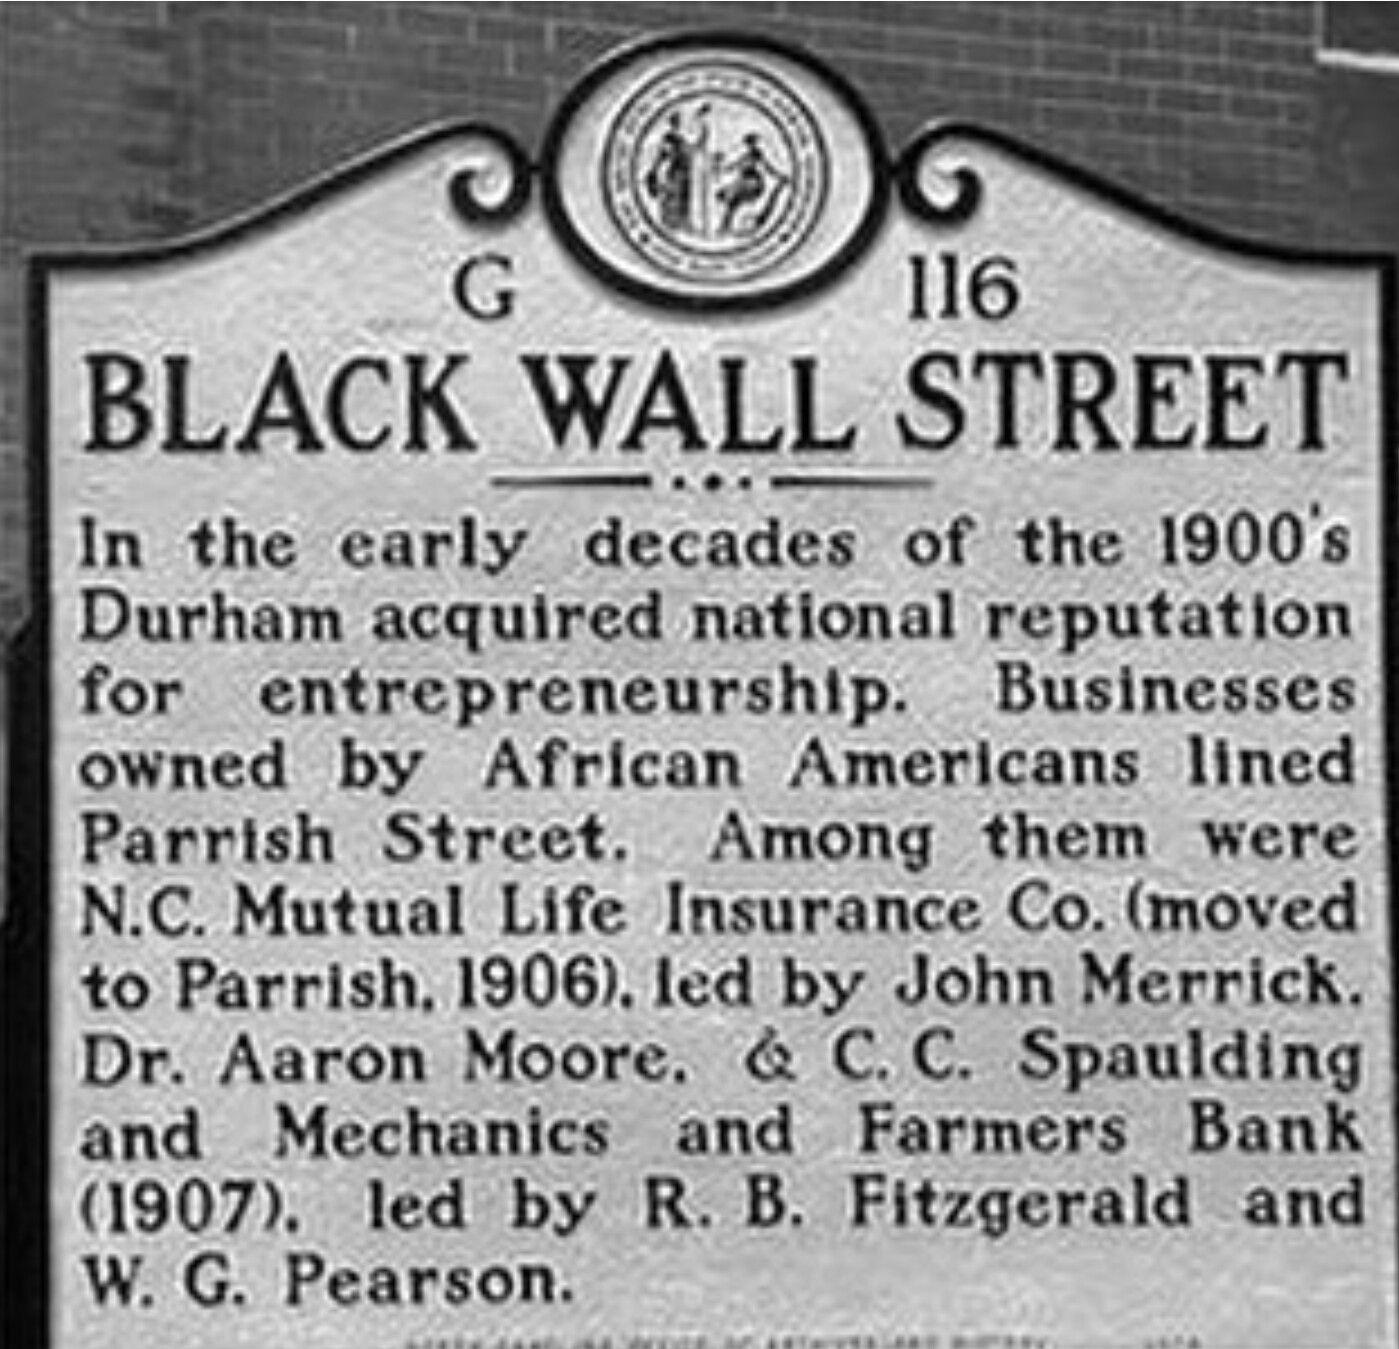 Pin by ken on black history black wall street north